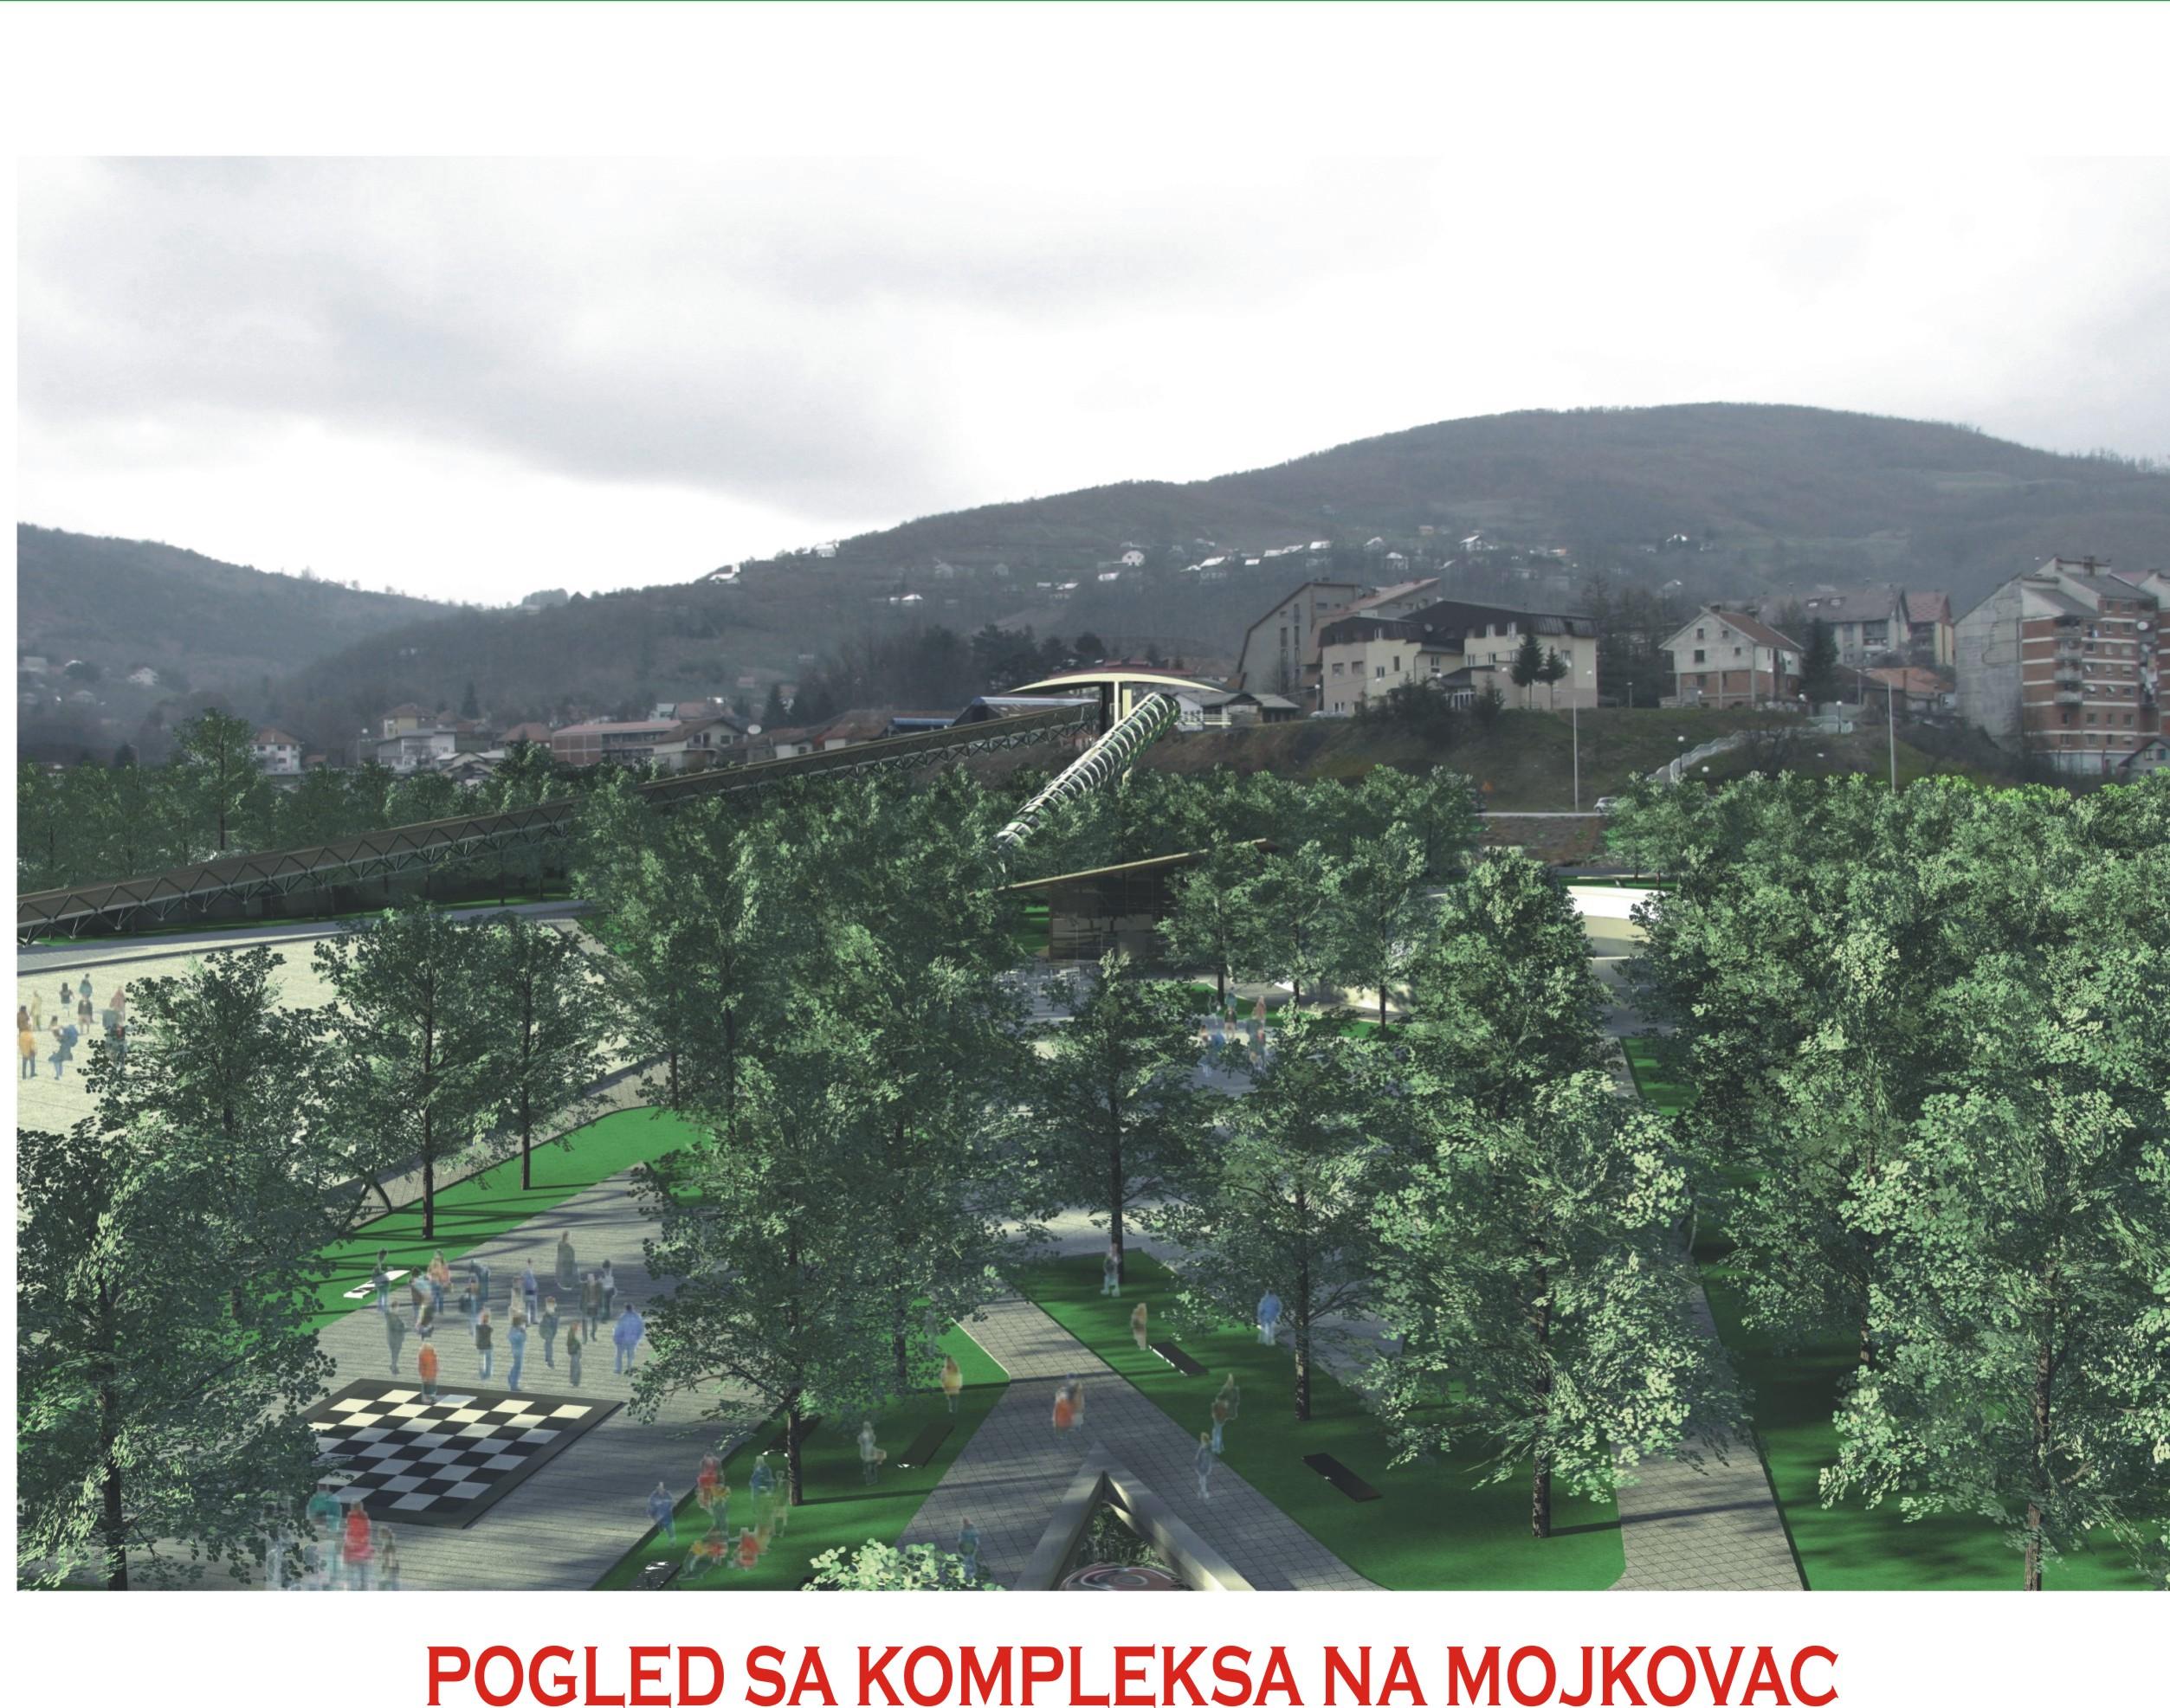 pogled_sa_kompleksa_na_mojkovac.jpg